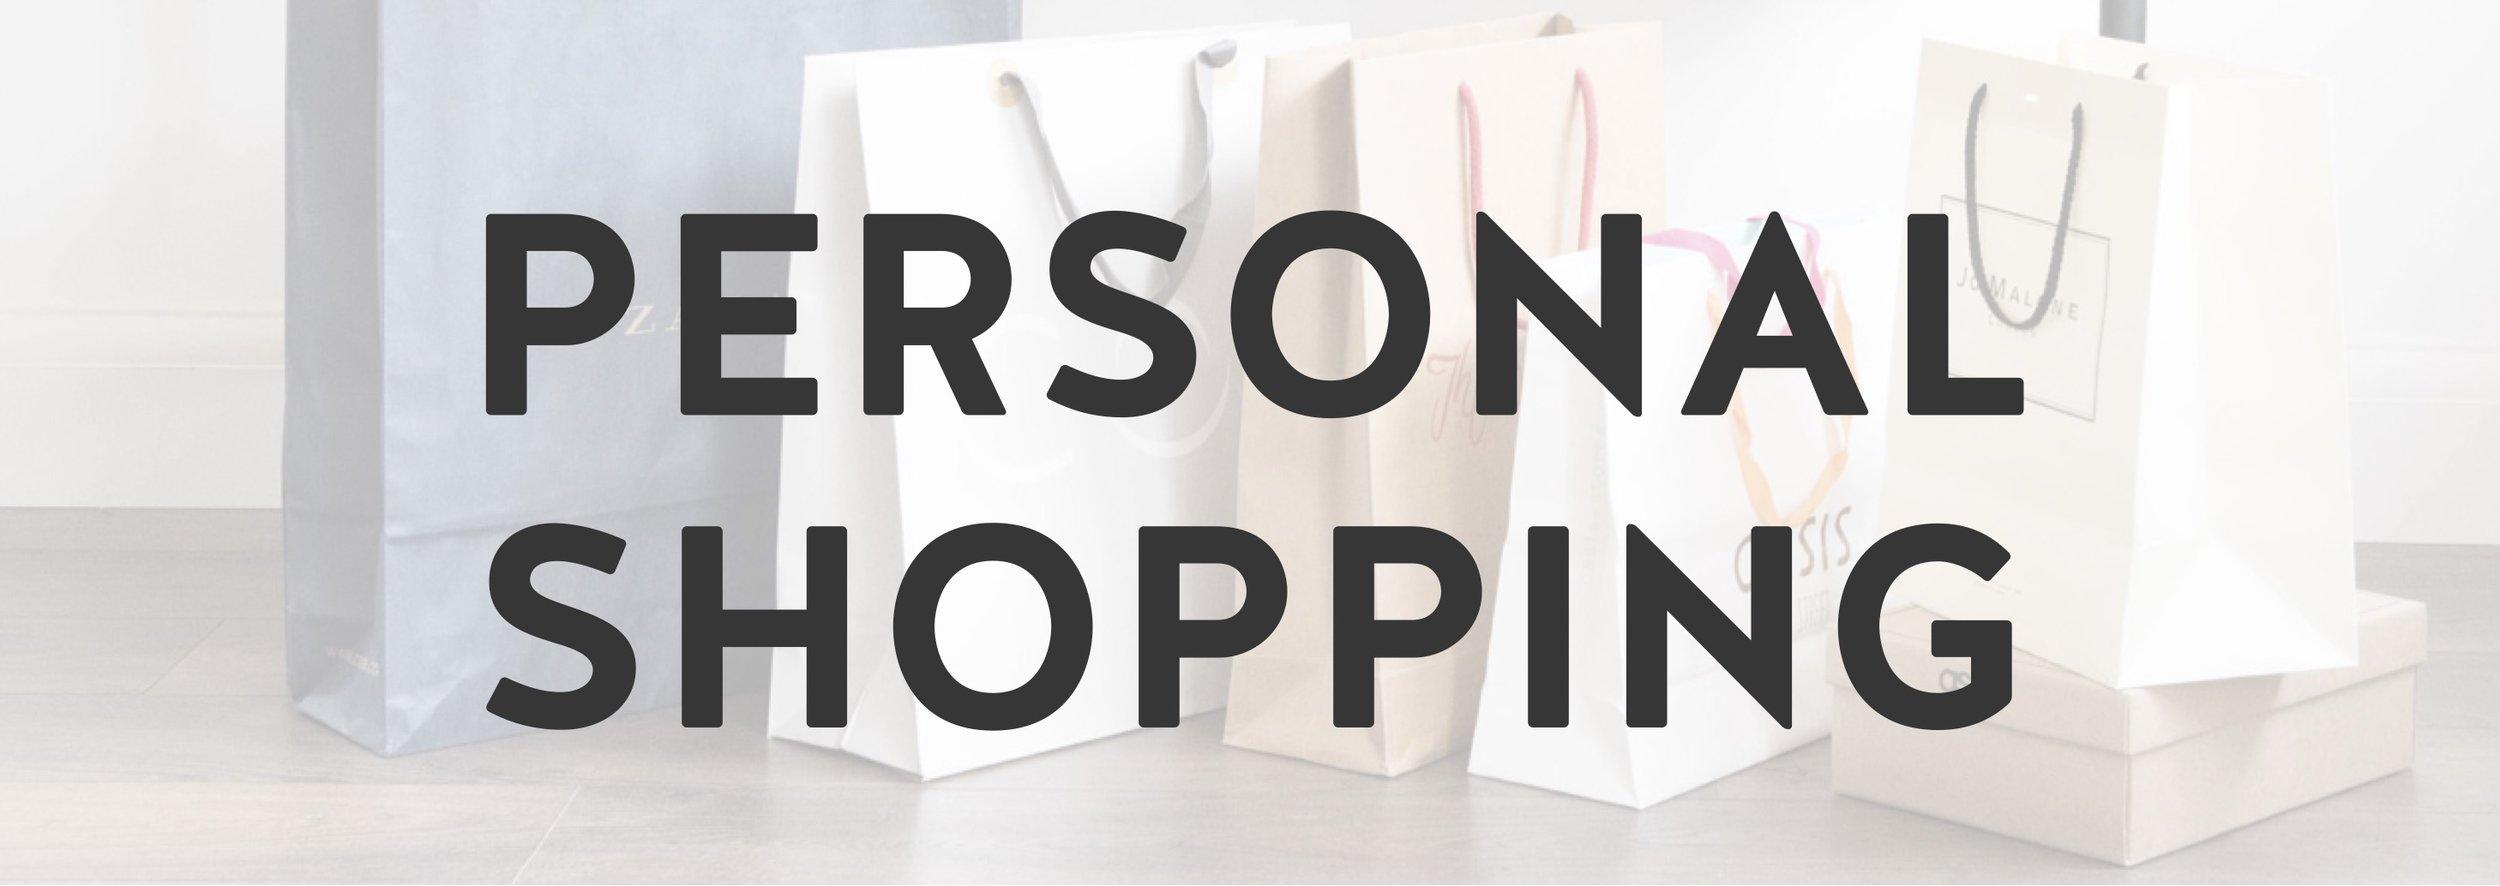 Personal Shopping | Hertfordshire